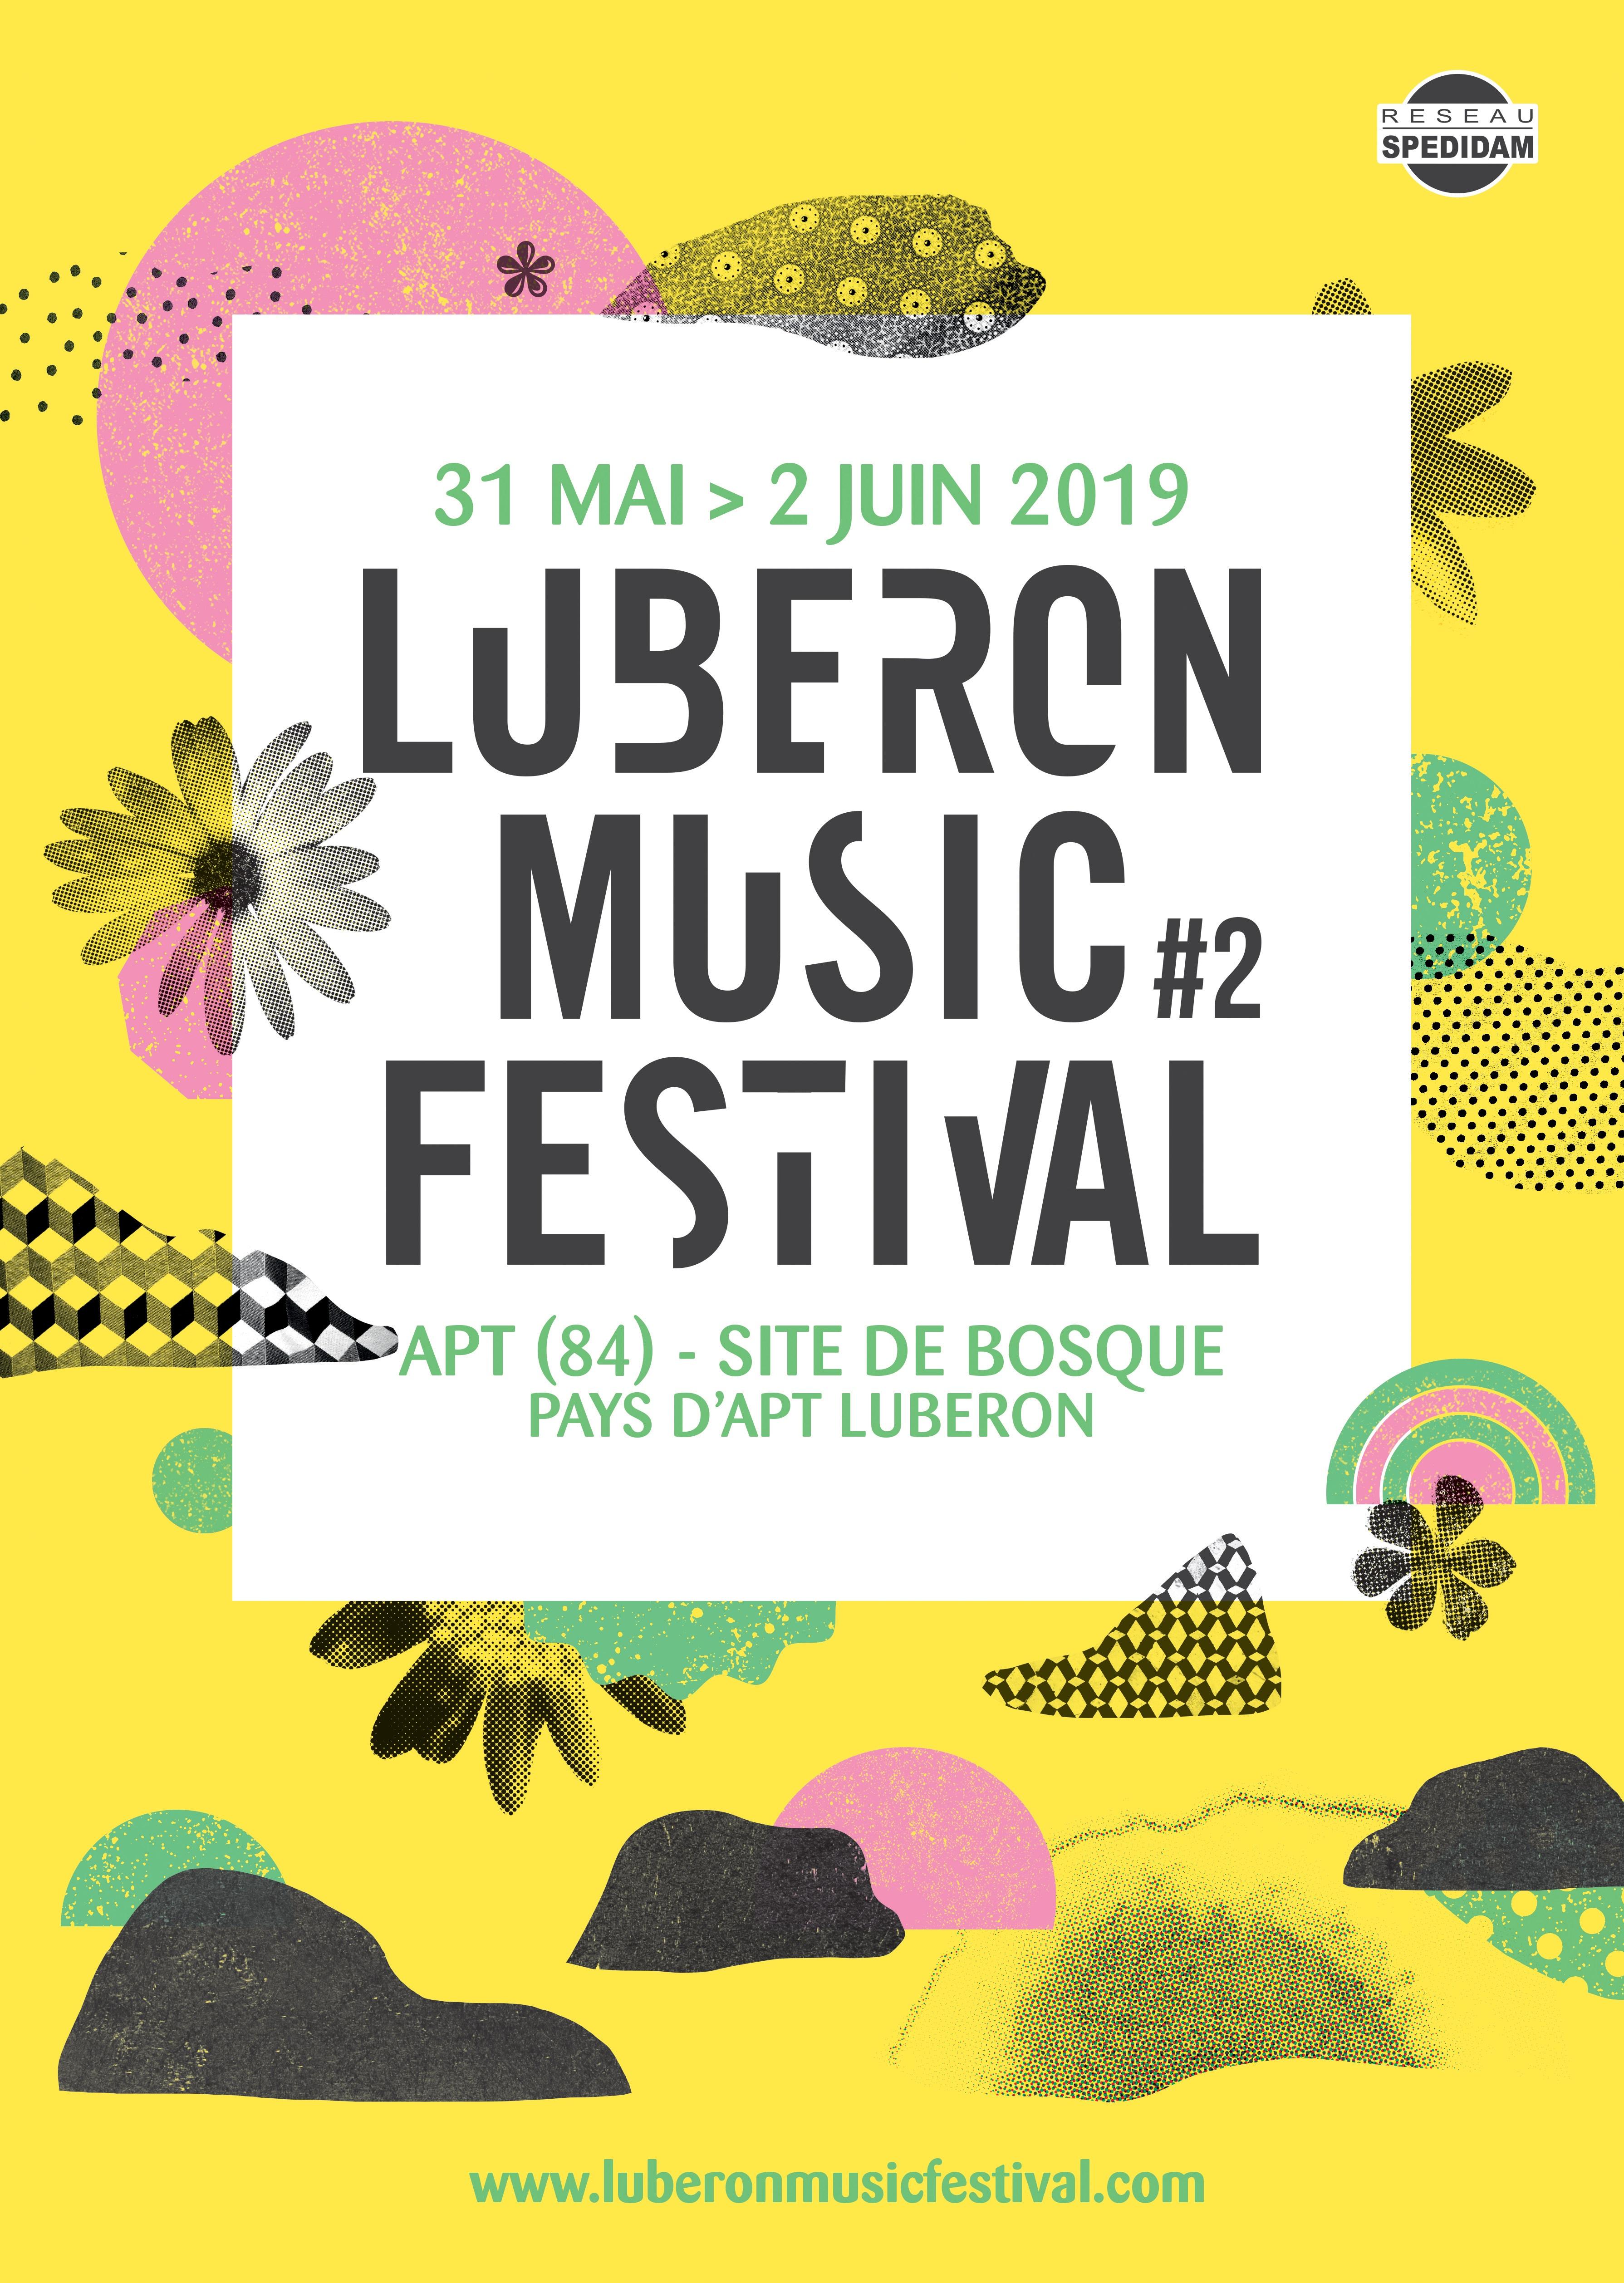 Luberon Music Festival #2